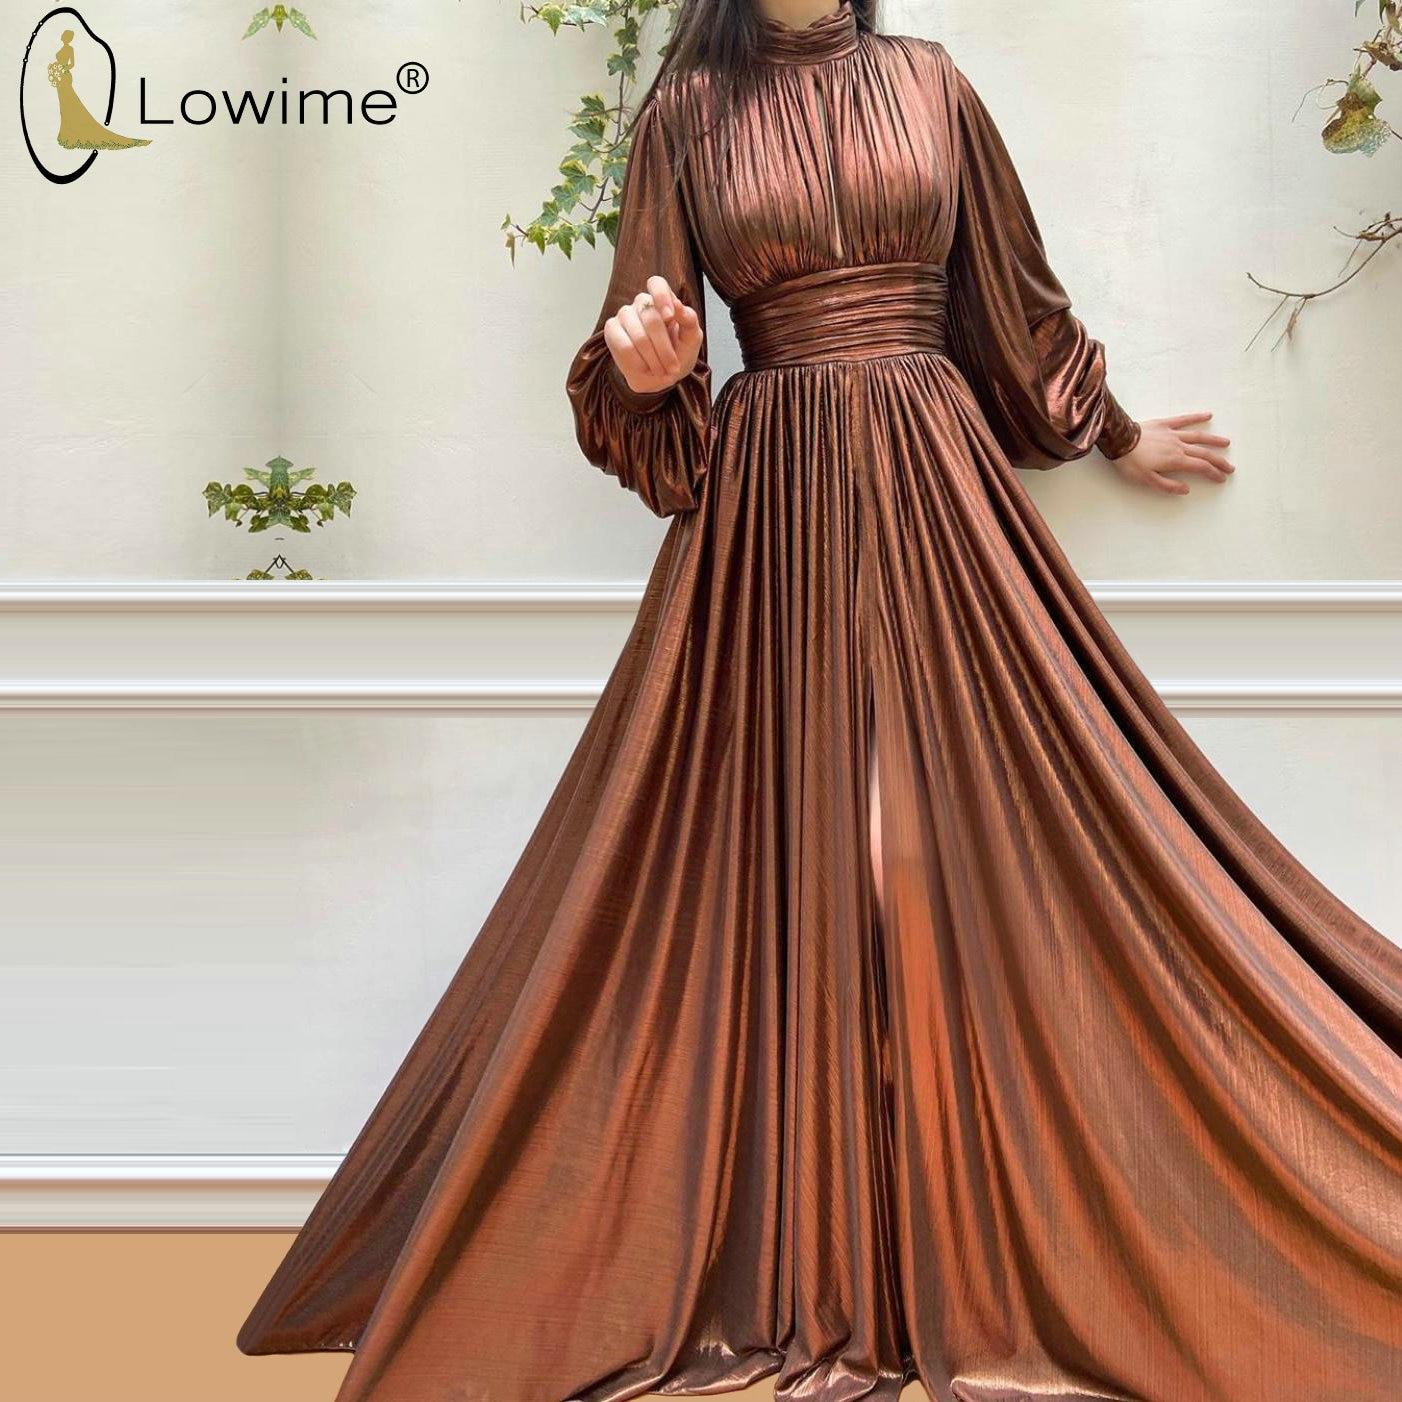 High Neck Long Puffy Sleeves Evening Dresses Ruched A Line Split Floor Length Vestidos De Fiesta De Noche Party Prom Gowns